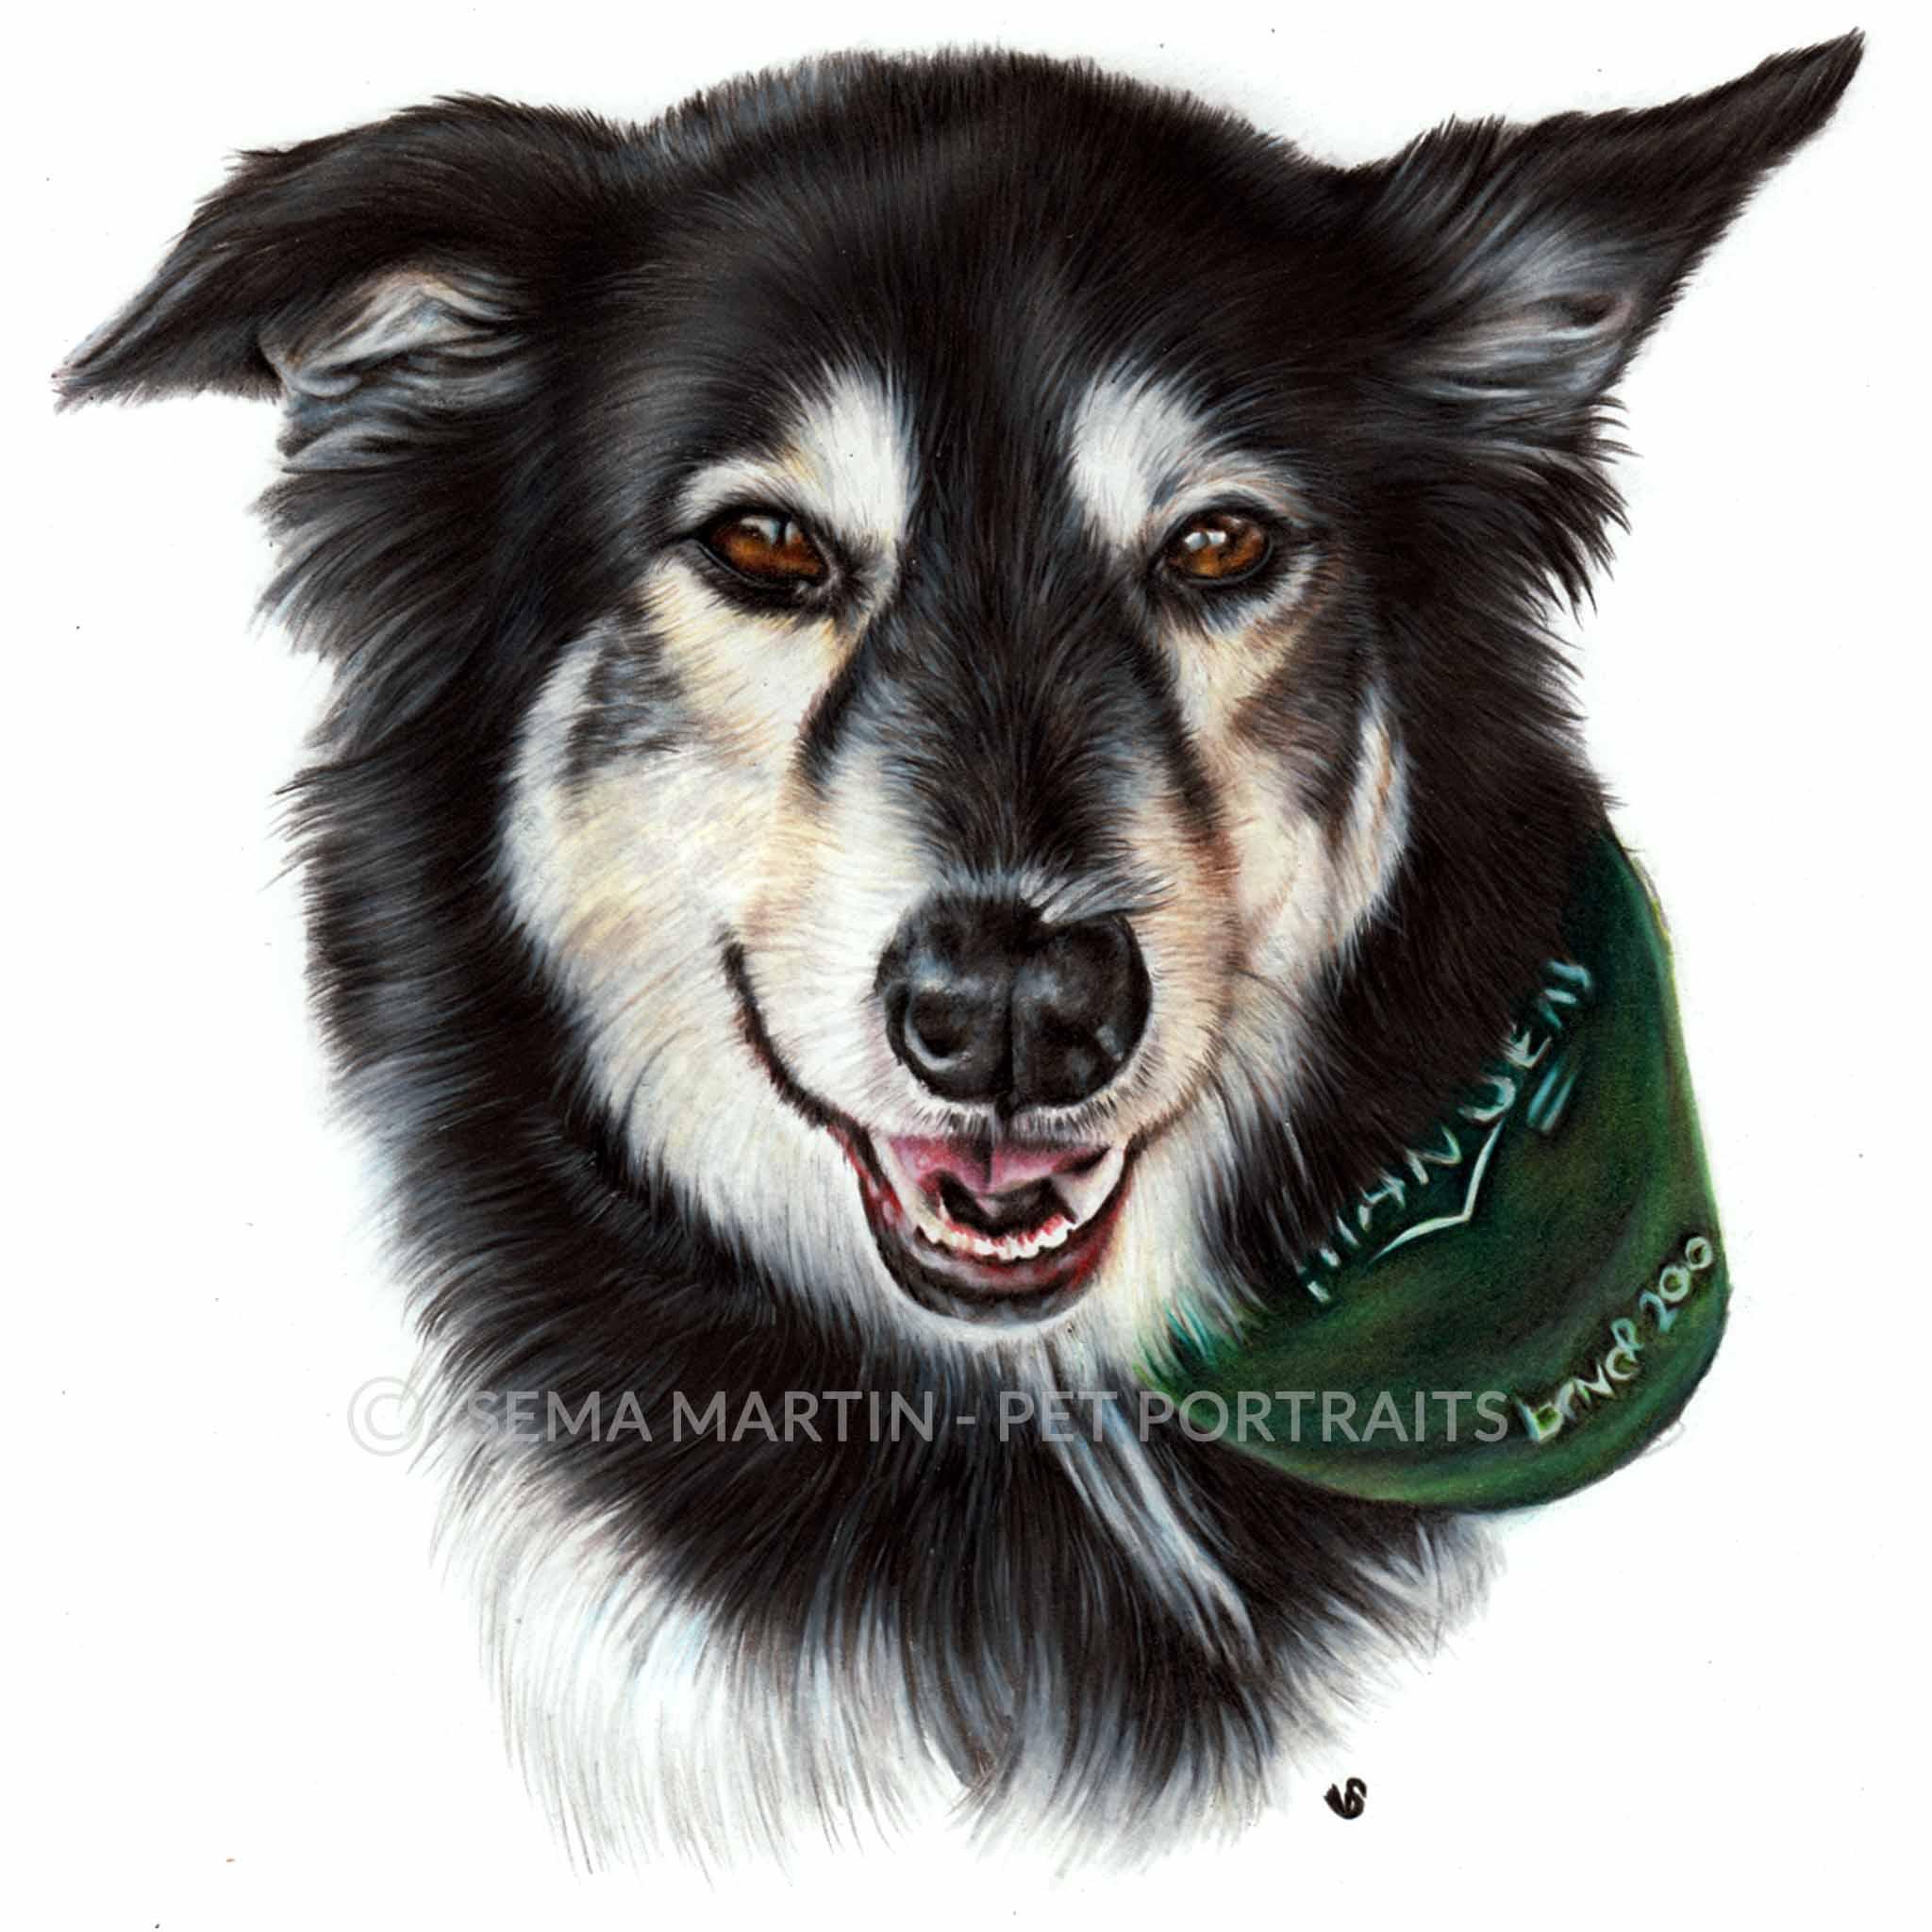 'Dolly' - USA, 8.3 x 11.7 inches, 2018, Colour Pencil Dog Portrait by Sema Martin